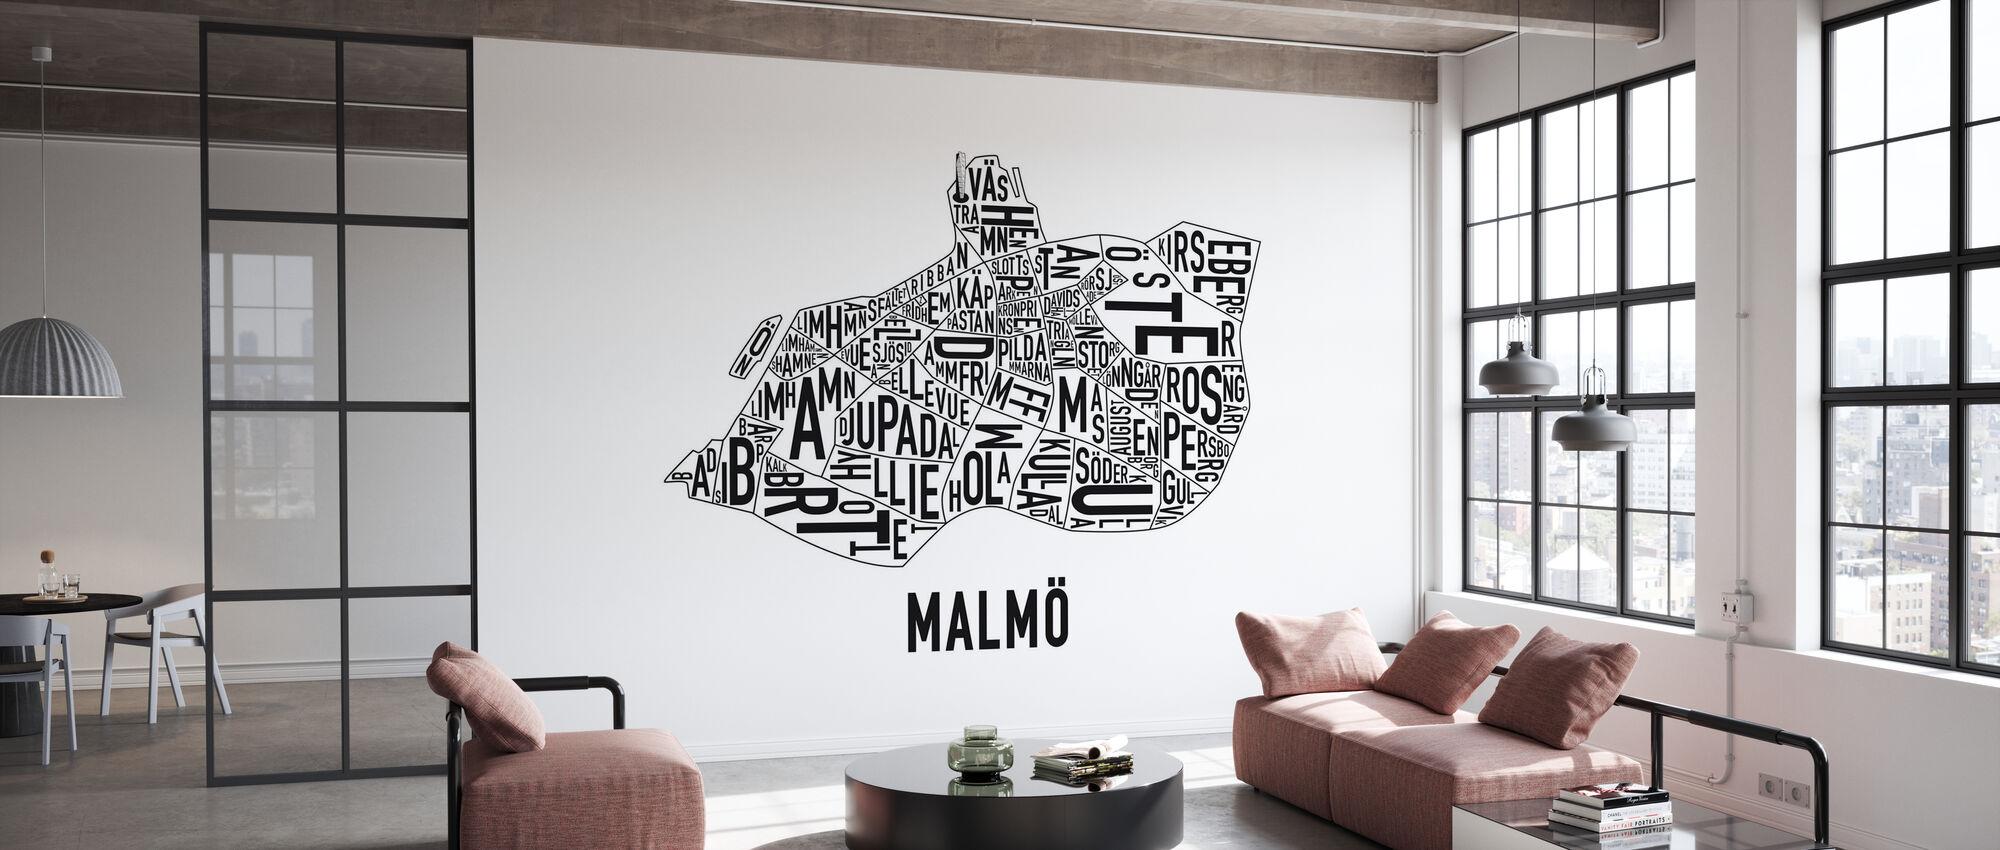 Malmö - Behang - Kantoor